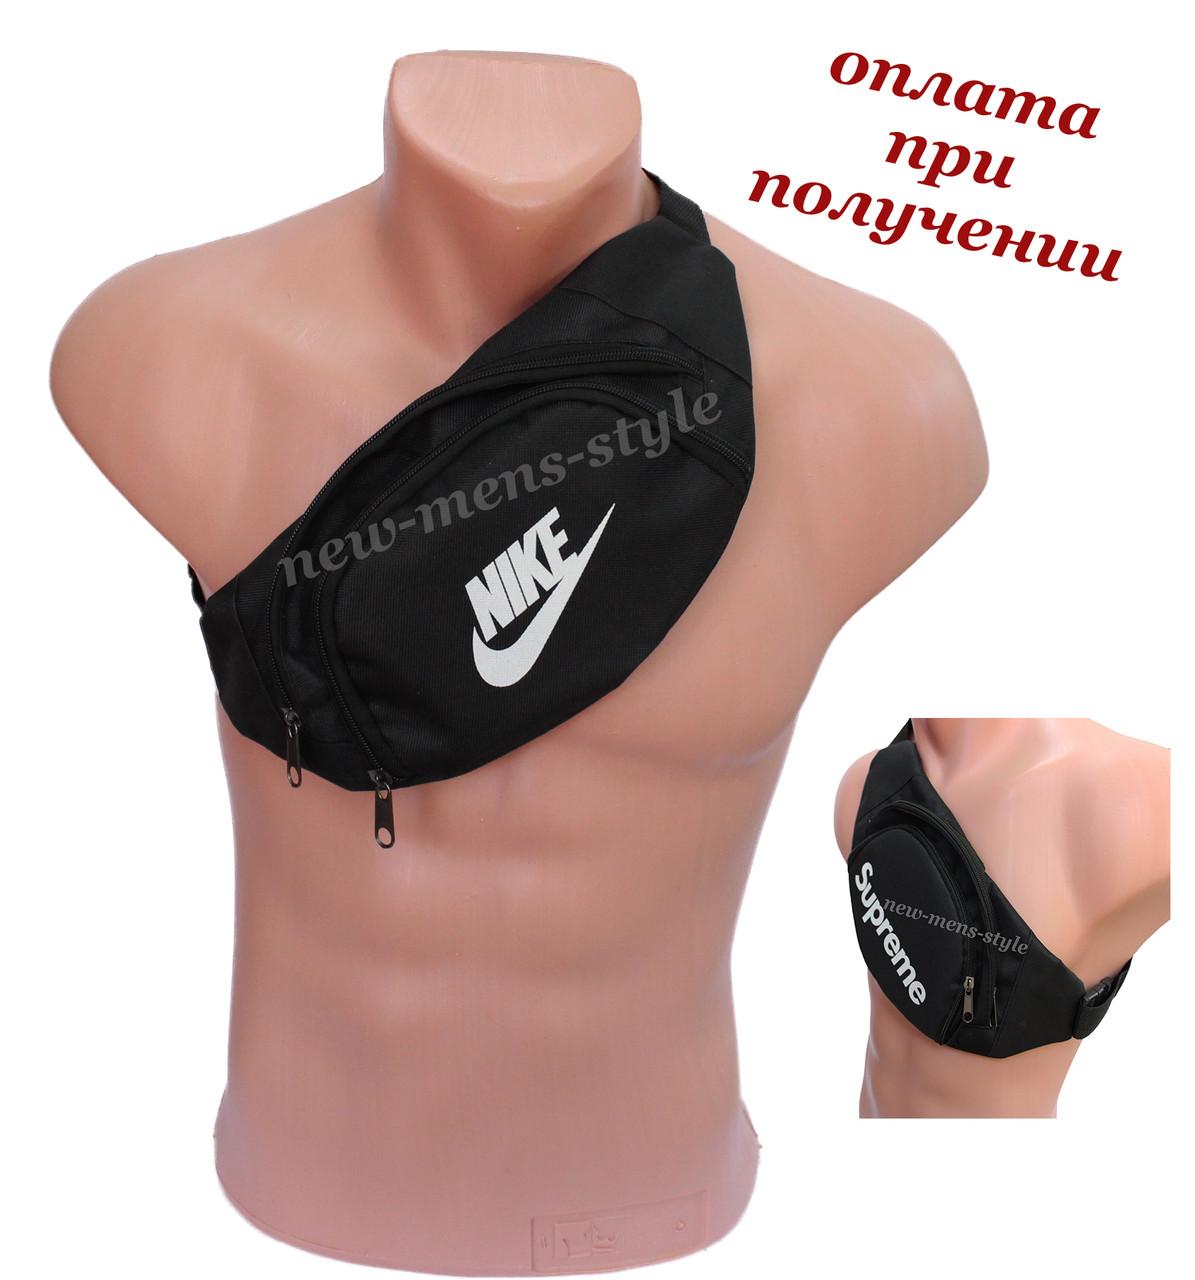 Чоловіча спортивна тканинна сумка слінг бананка рюкзак на пояс через плече груди Supreme або Nike